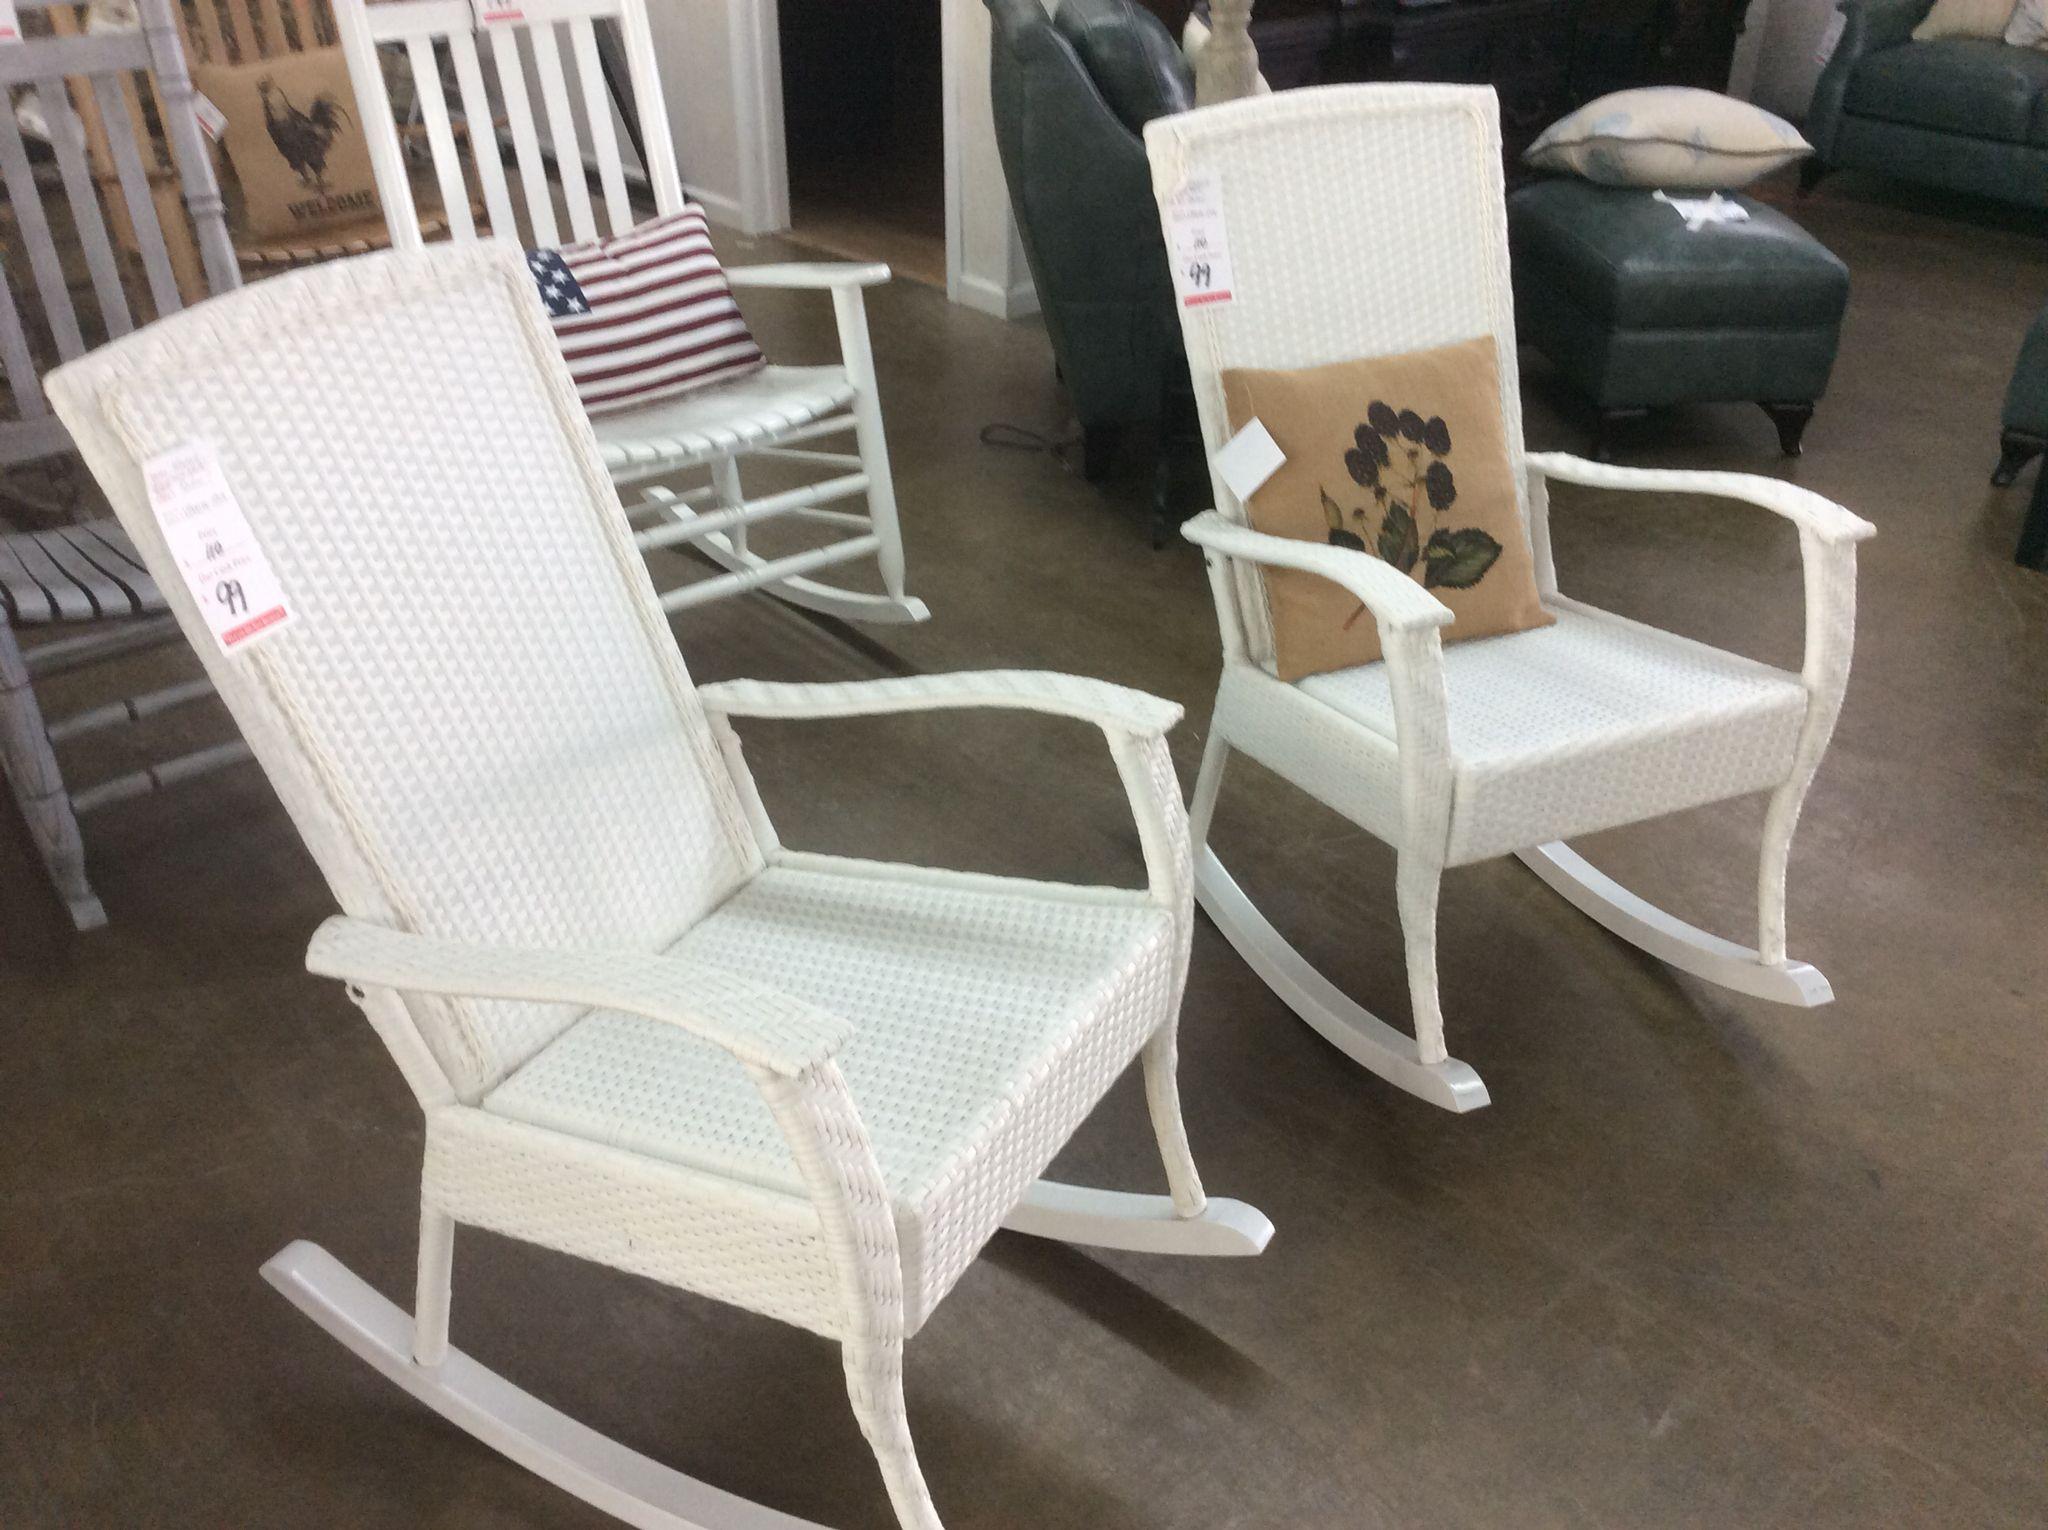 Marvelous Hinkle Rocker Odds Ends Home Decor Rocking Chair Theyellowbook Wood Chair Design Ideas Theyellowbookinfo